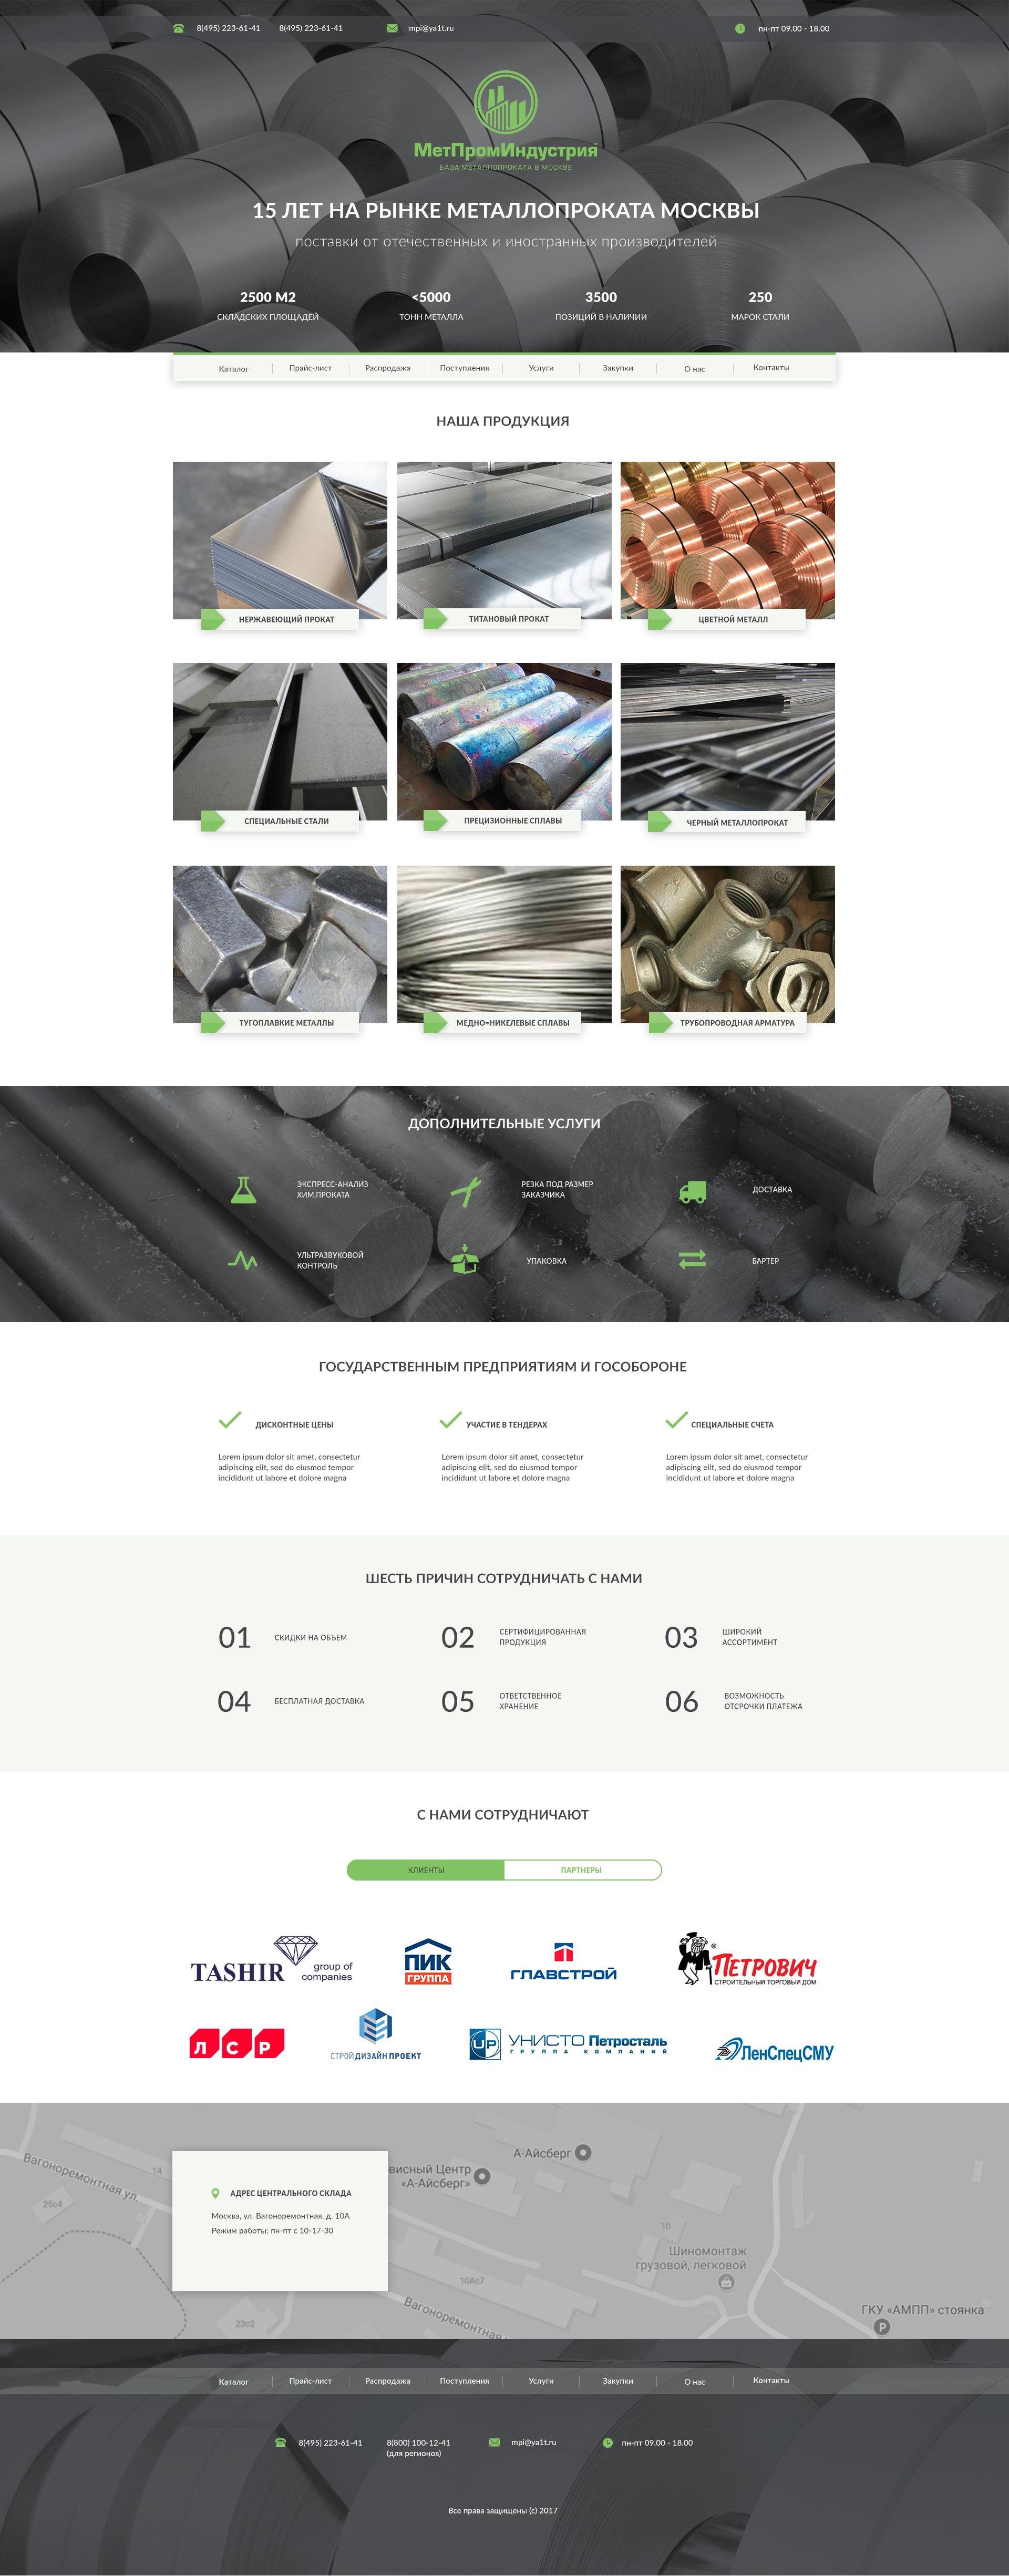 Дизайн сайта для металлоторгующей компании фото f_402599057b0e12fb.jpg